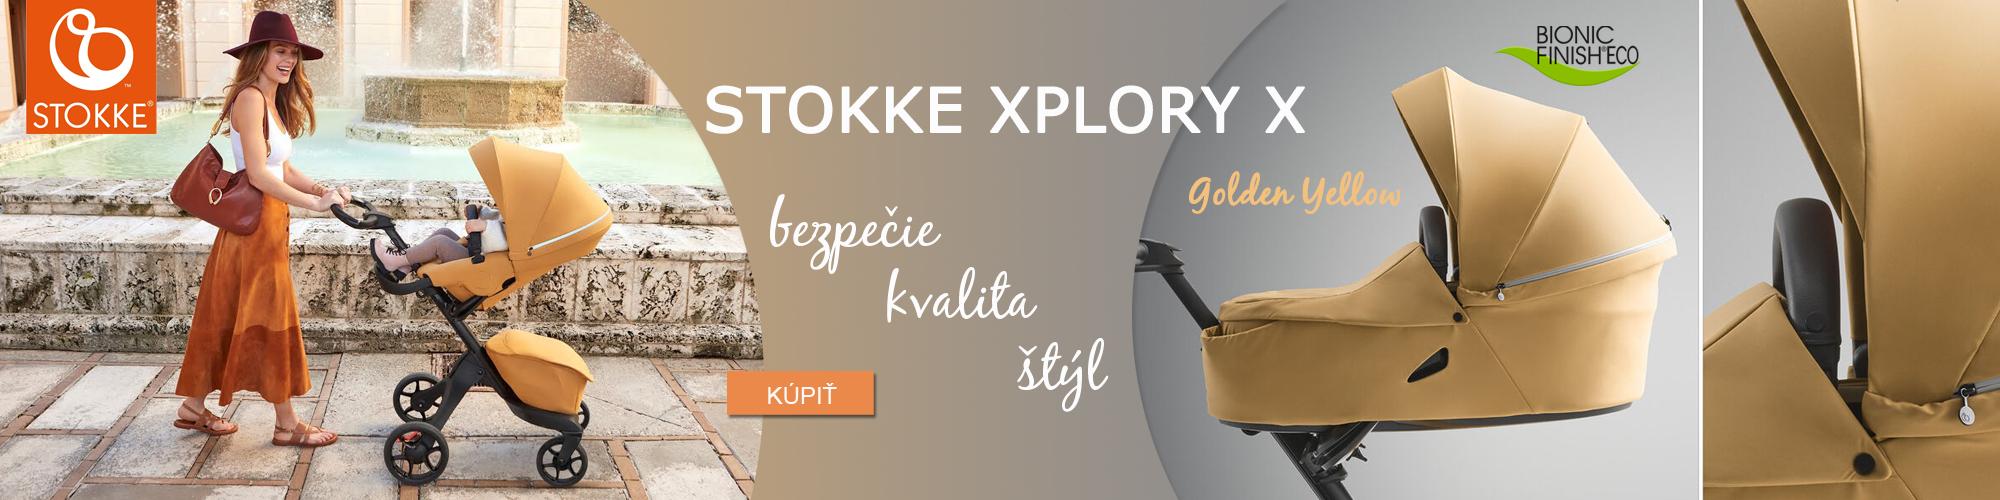 Stokke Xplory X